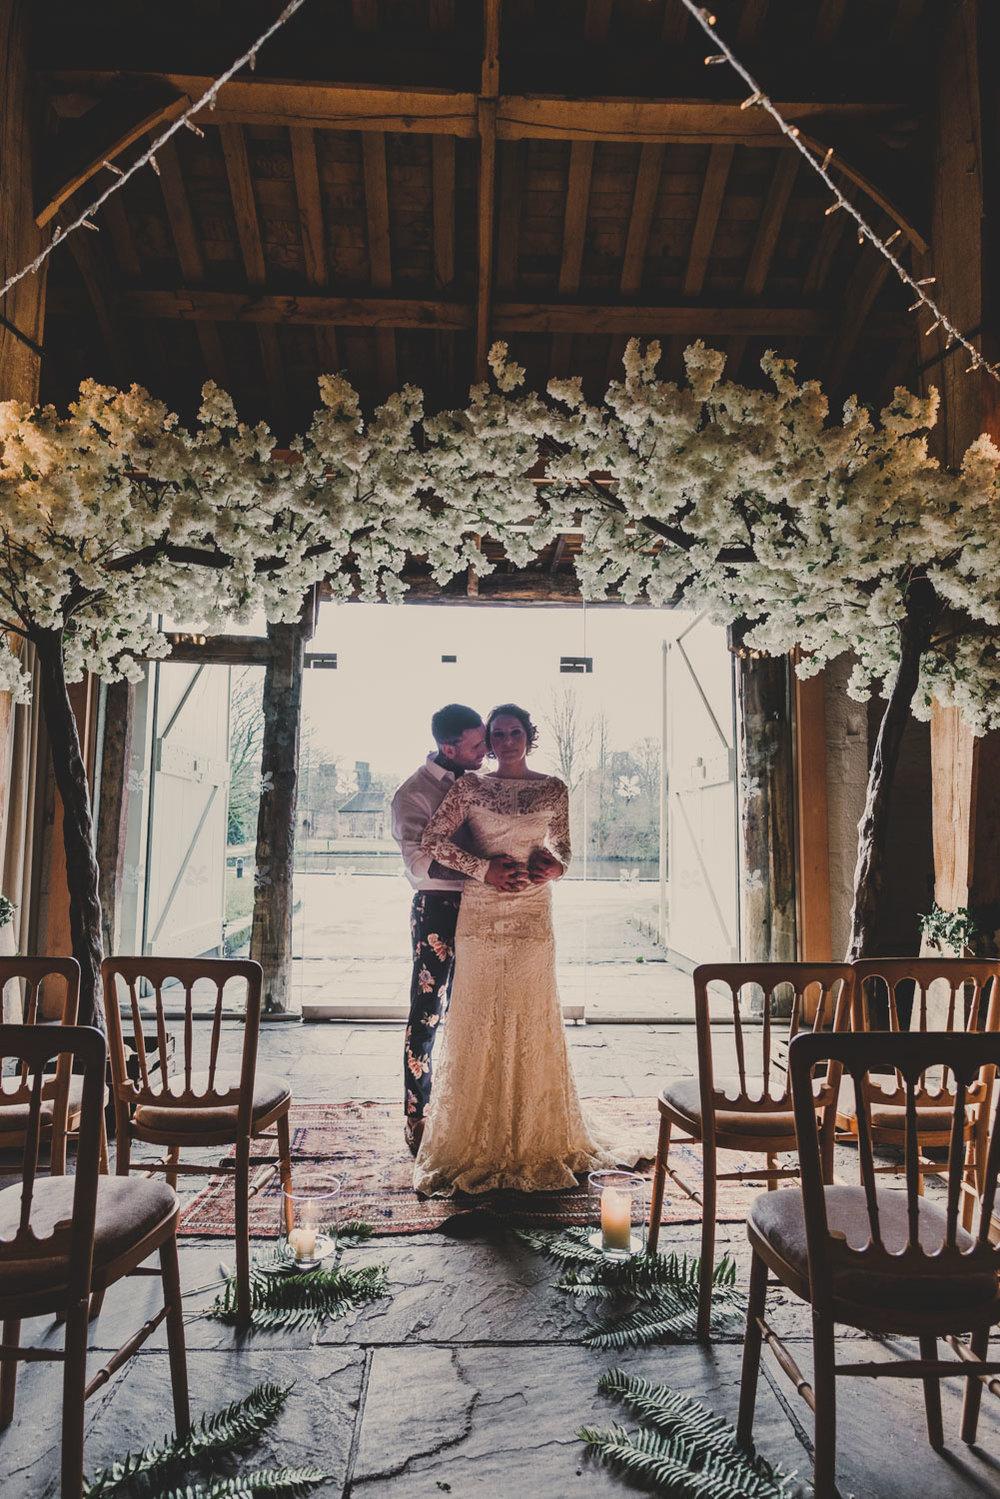 east-riddlesden-hall-wedding-jade-maguire-photography (20).jpg